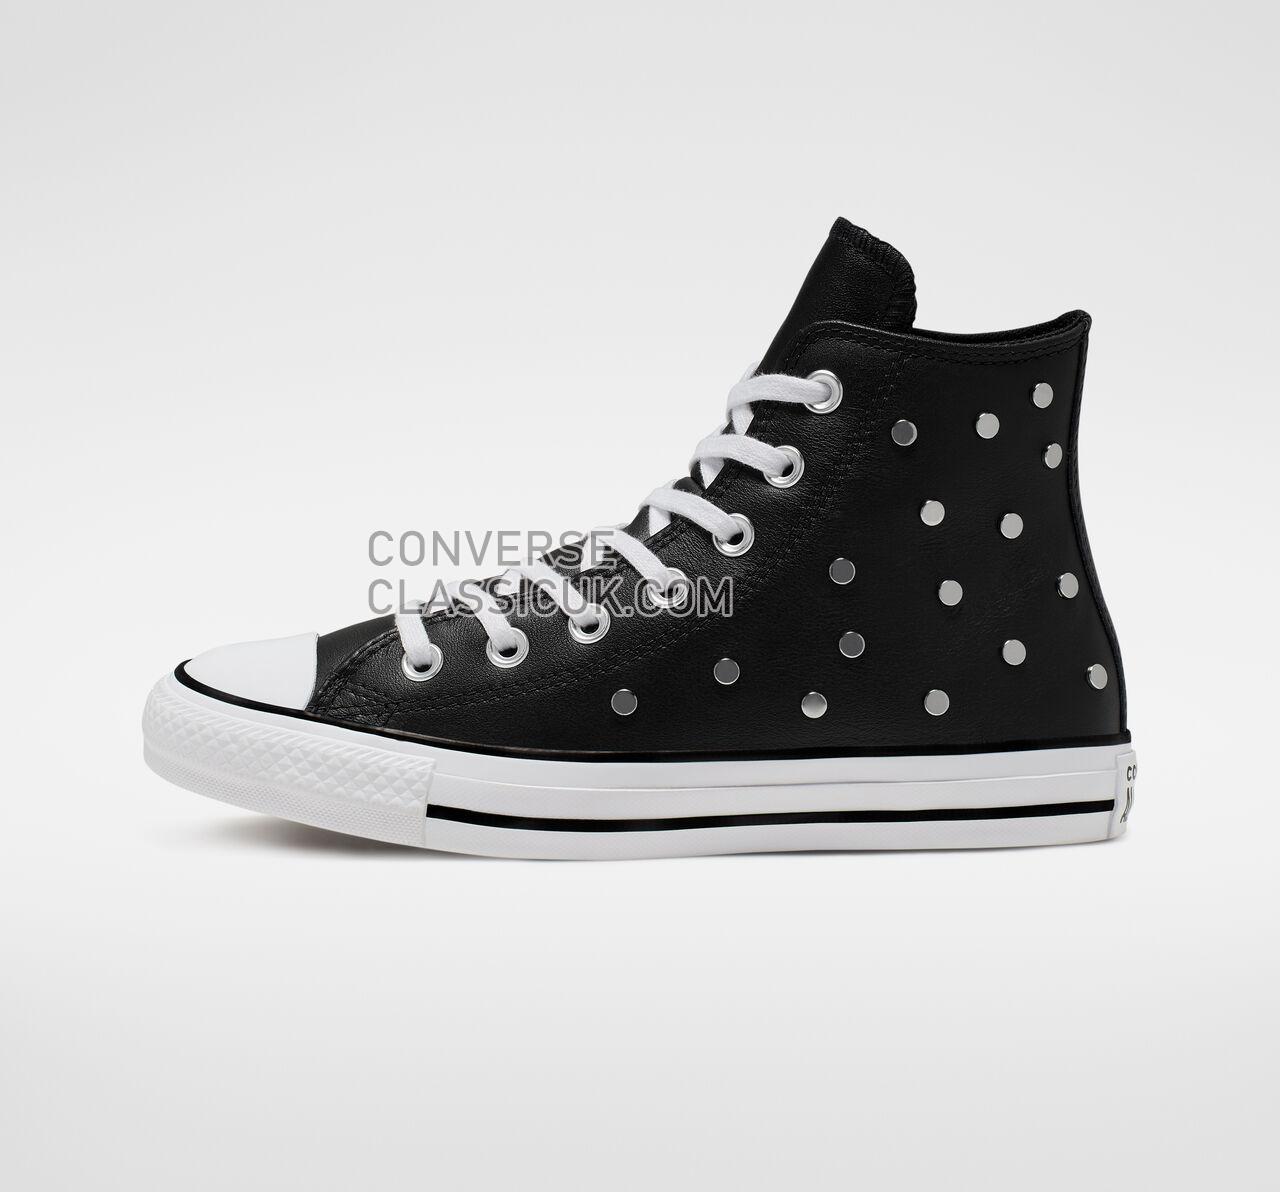 Converse Chuck Taylor All Star Studs High Top Womens 565849C Black/White/Black Shoes